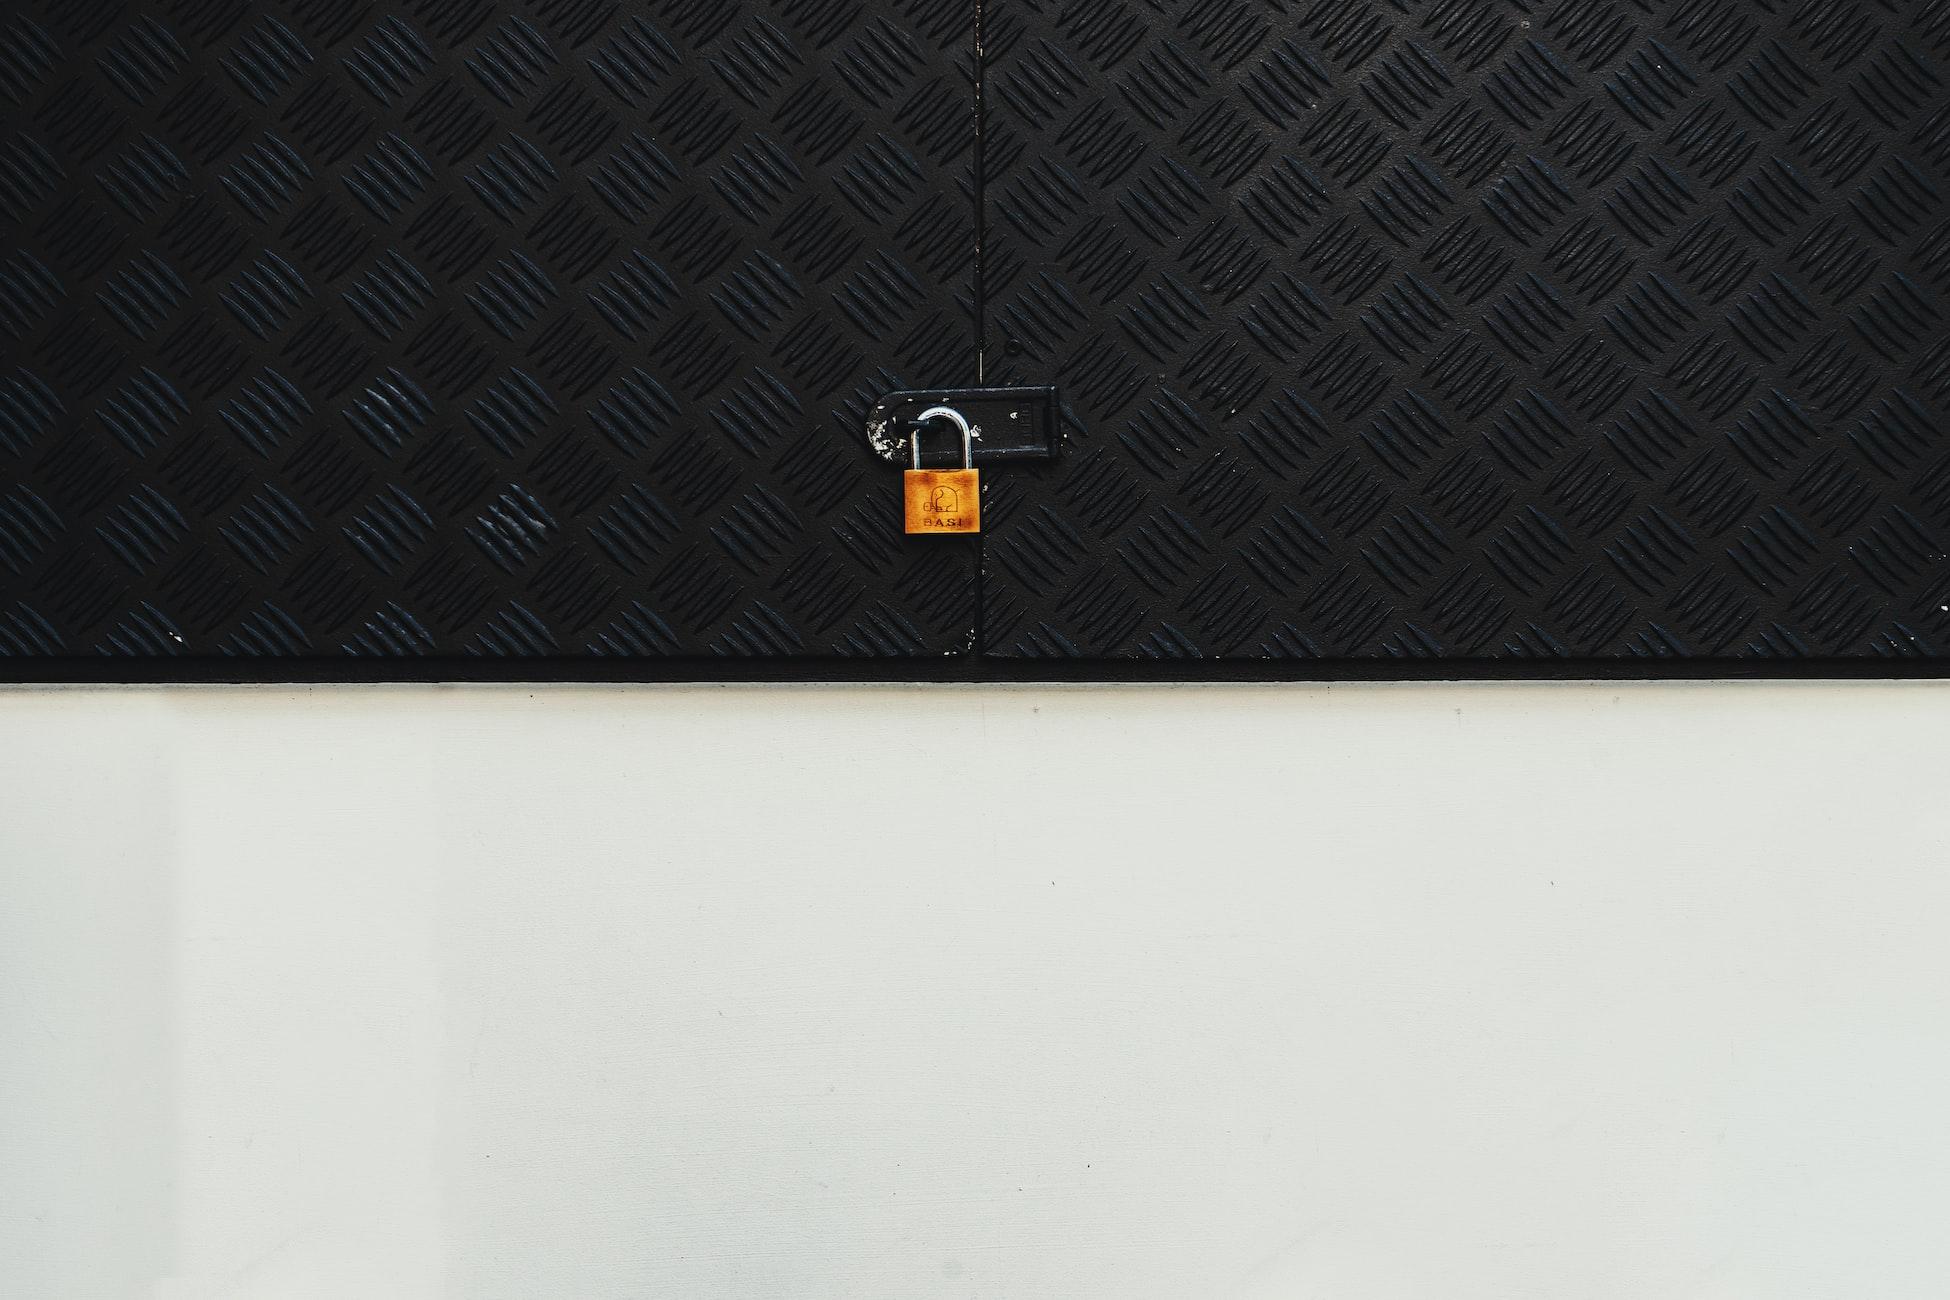 Padlock on Wall